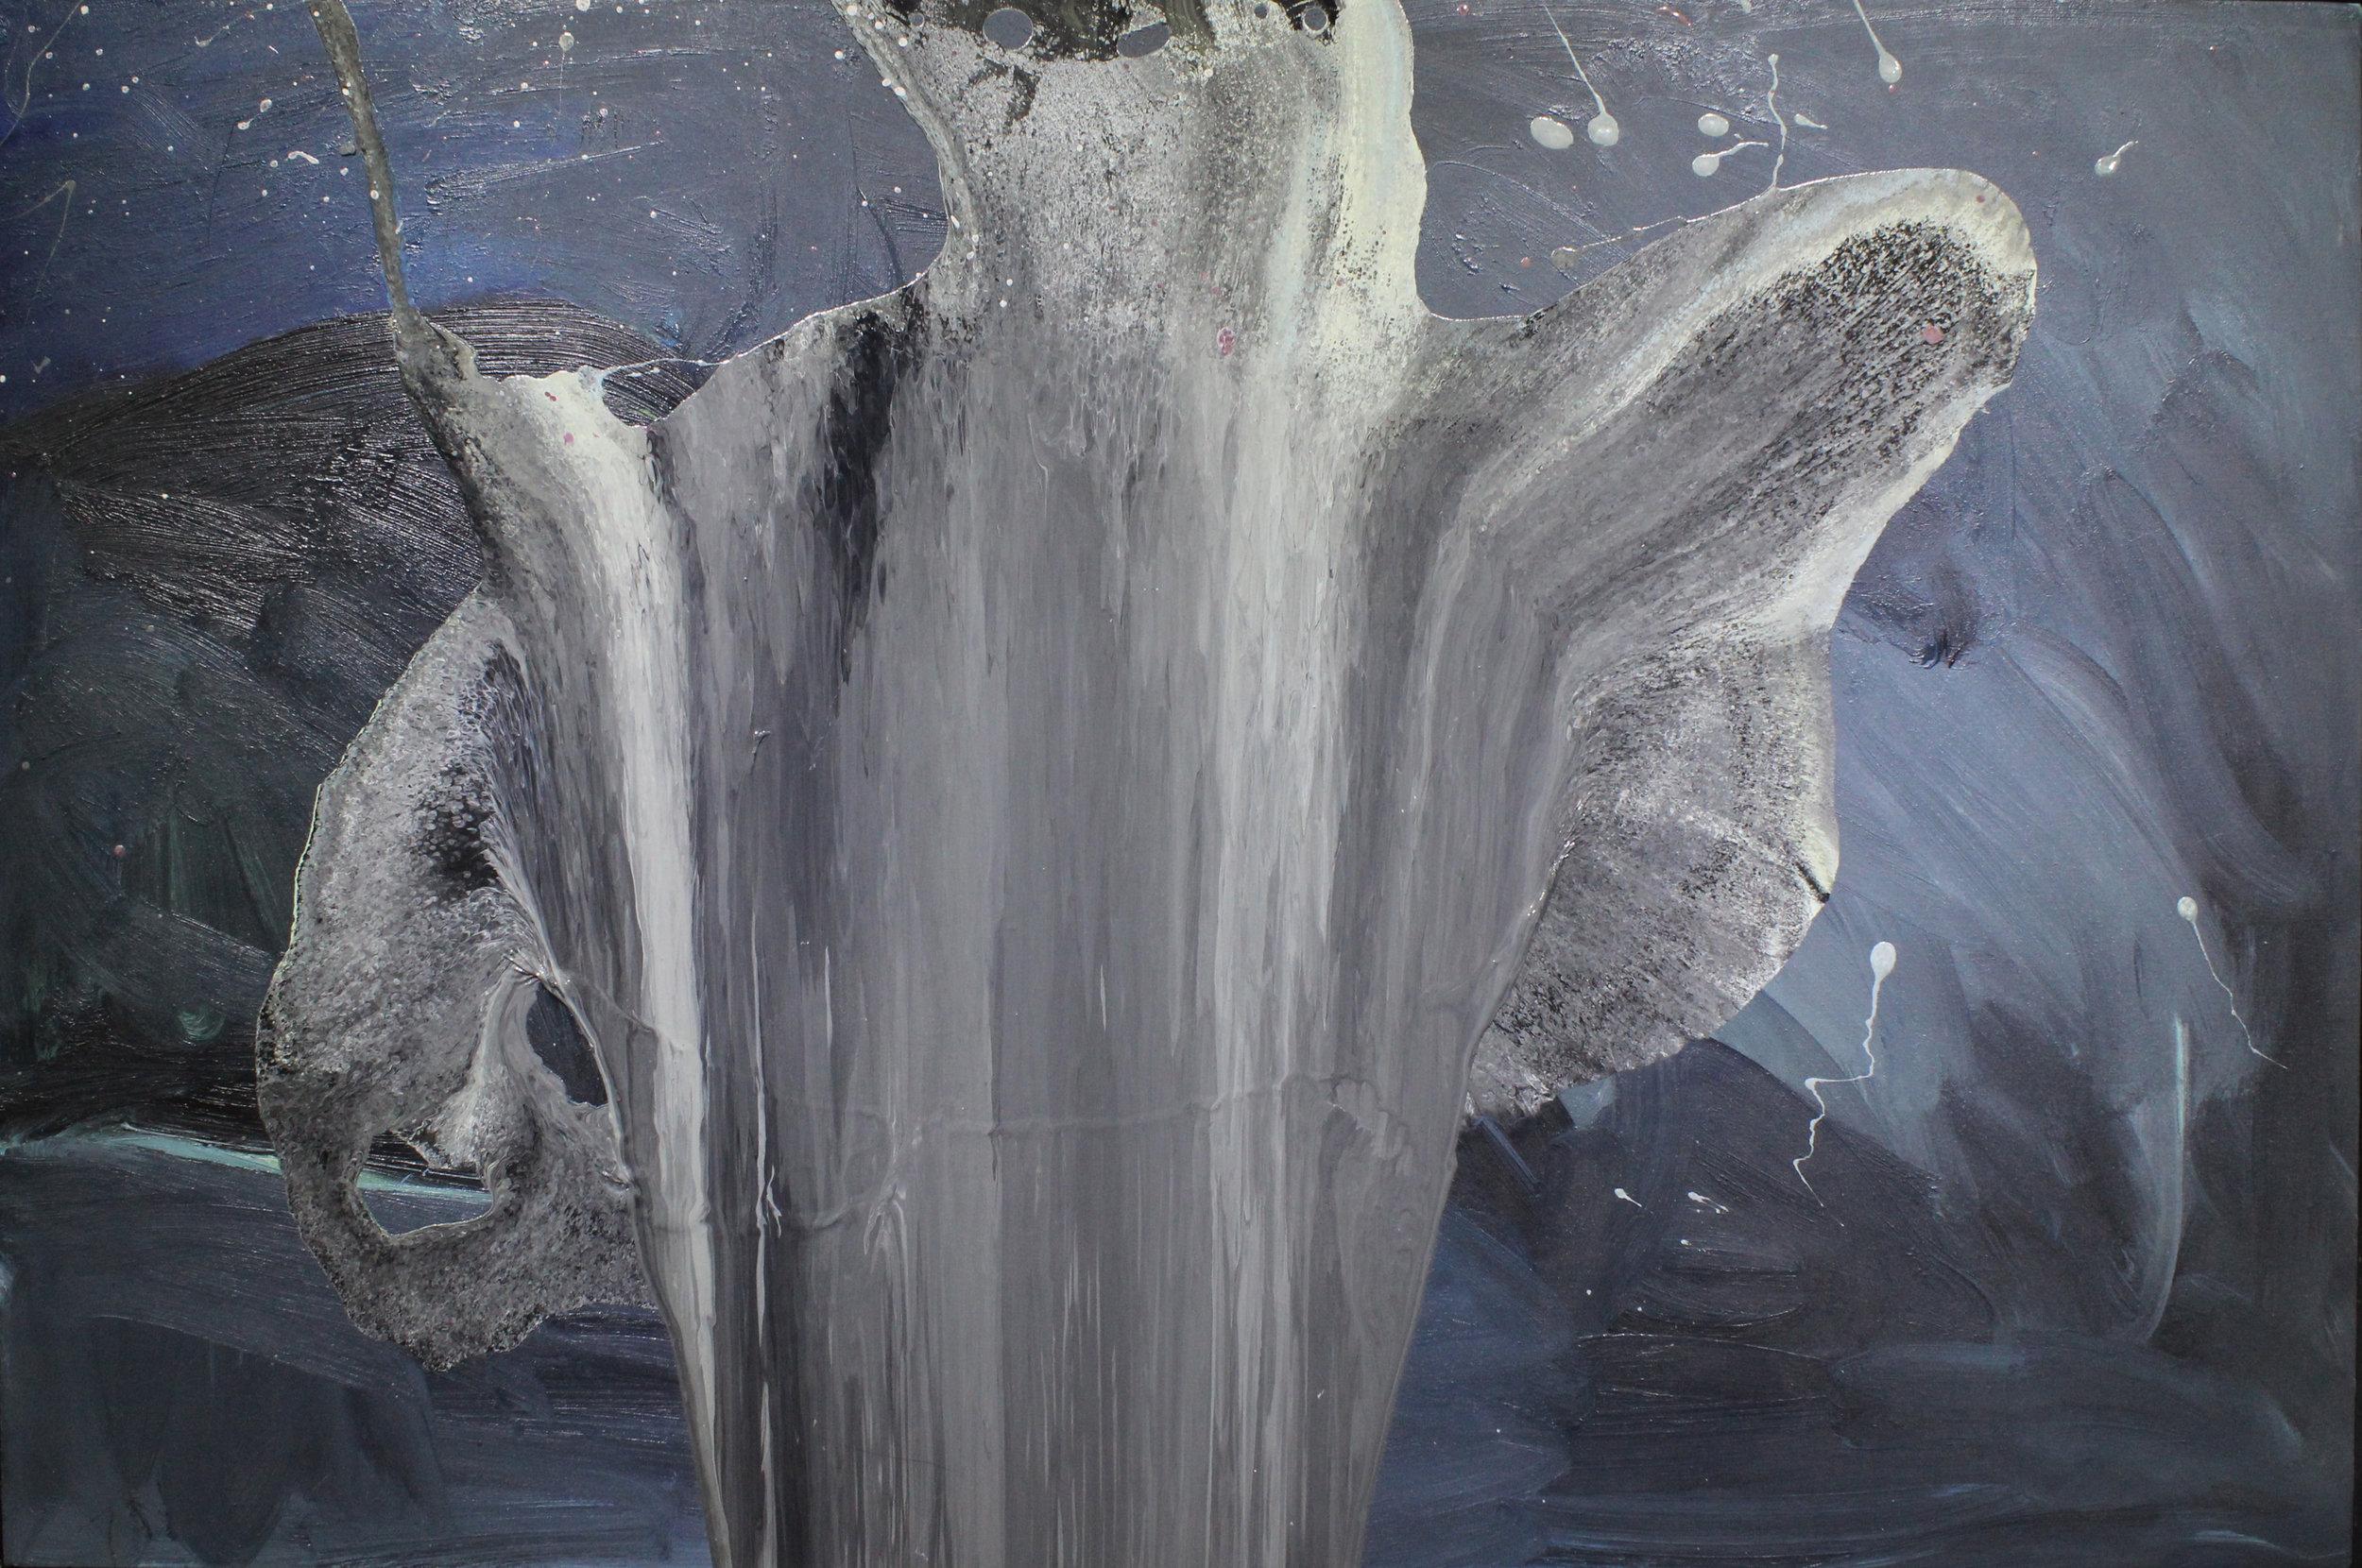 Untitled, 2013, enamel paint on canvas, 61 x 91 cm